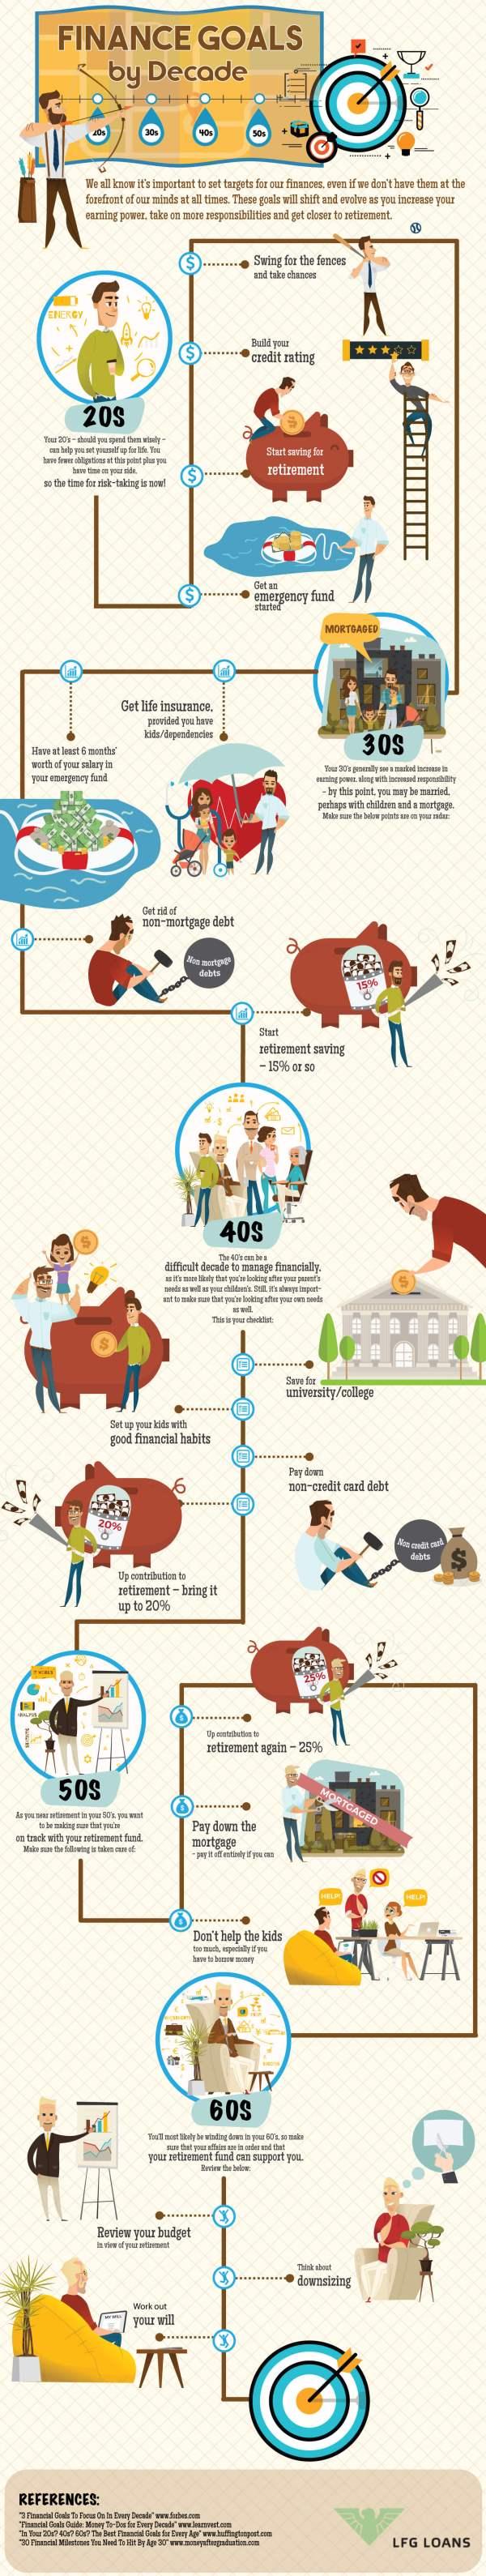 Finance_Goals_infographic